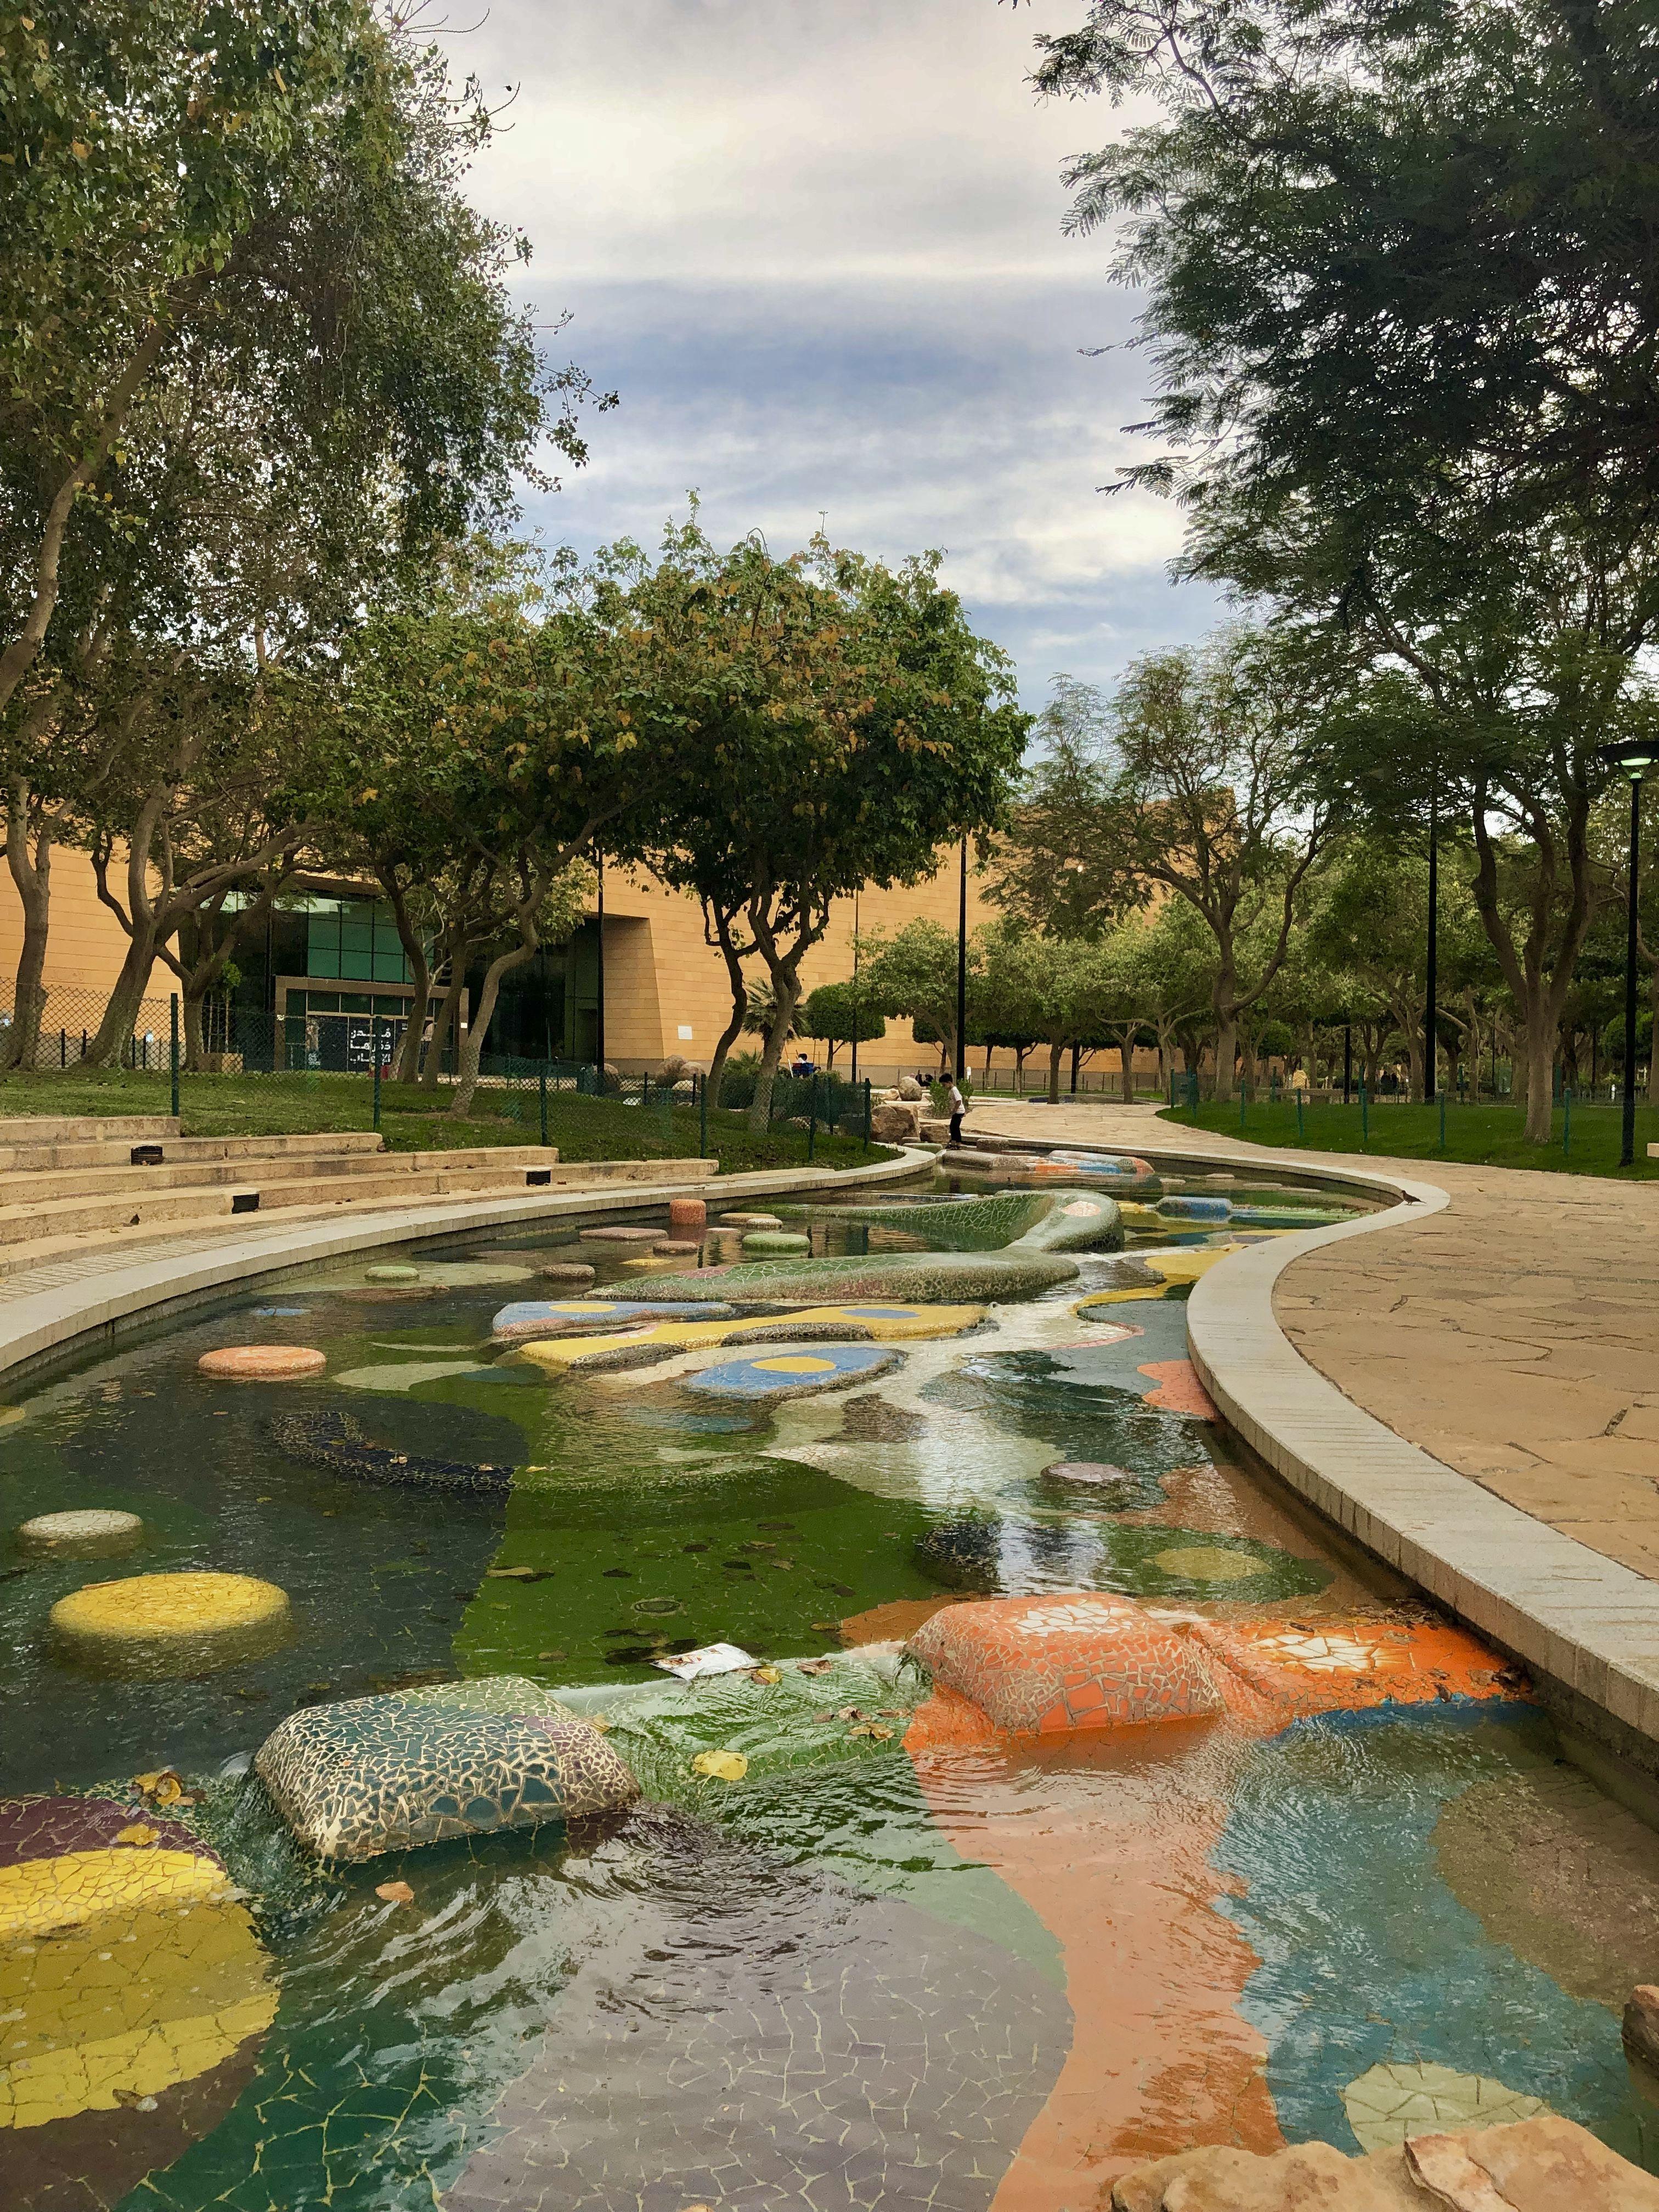 National Museum S Park The Parks At King Abdulaziz Historical Center Are Among The Best In Riyadh Just Next To The Riyadh Riyadh Saudi Arabia Saudi Arabia